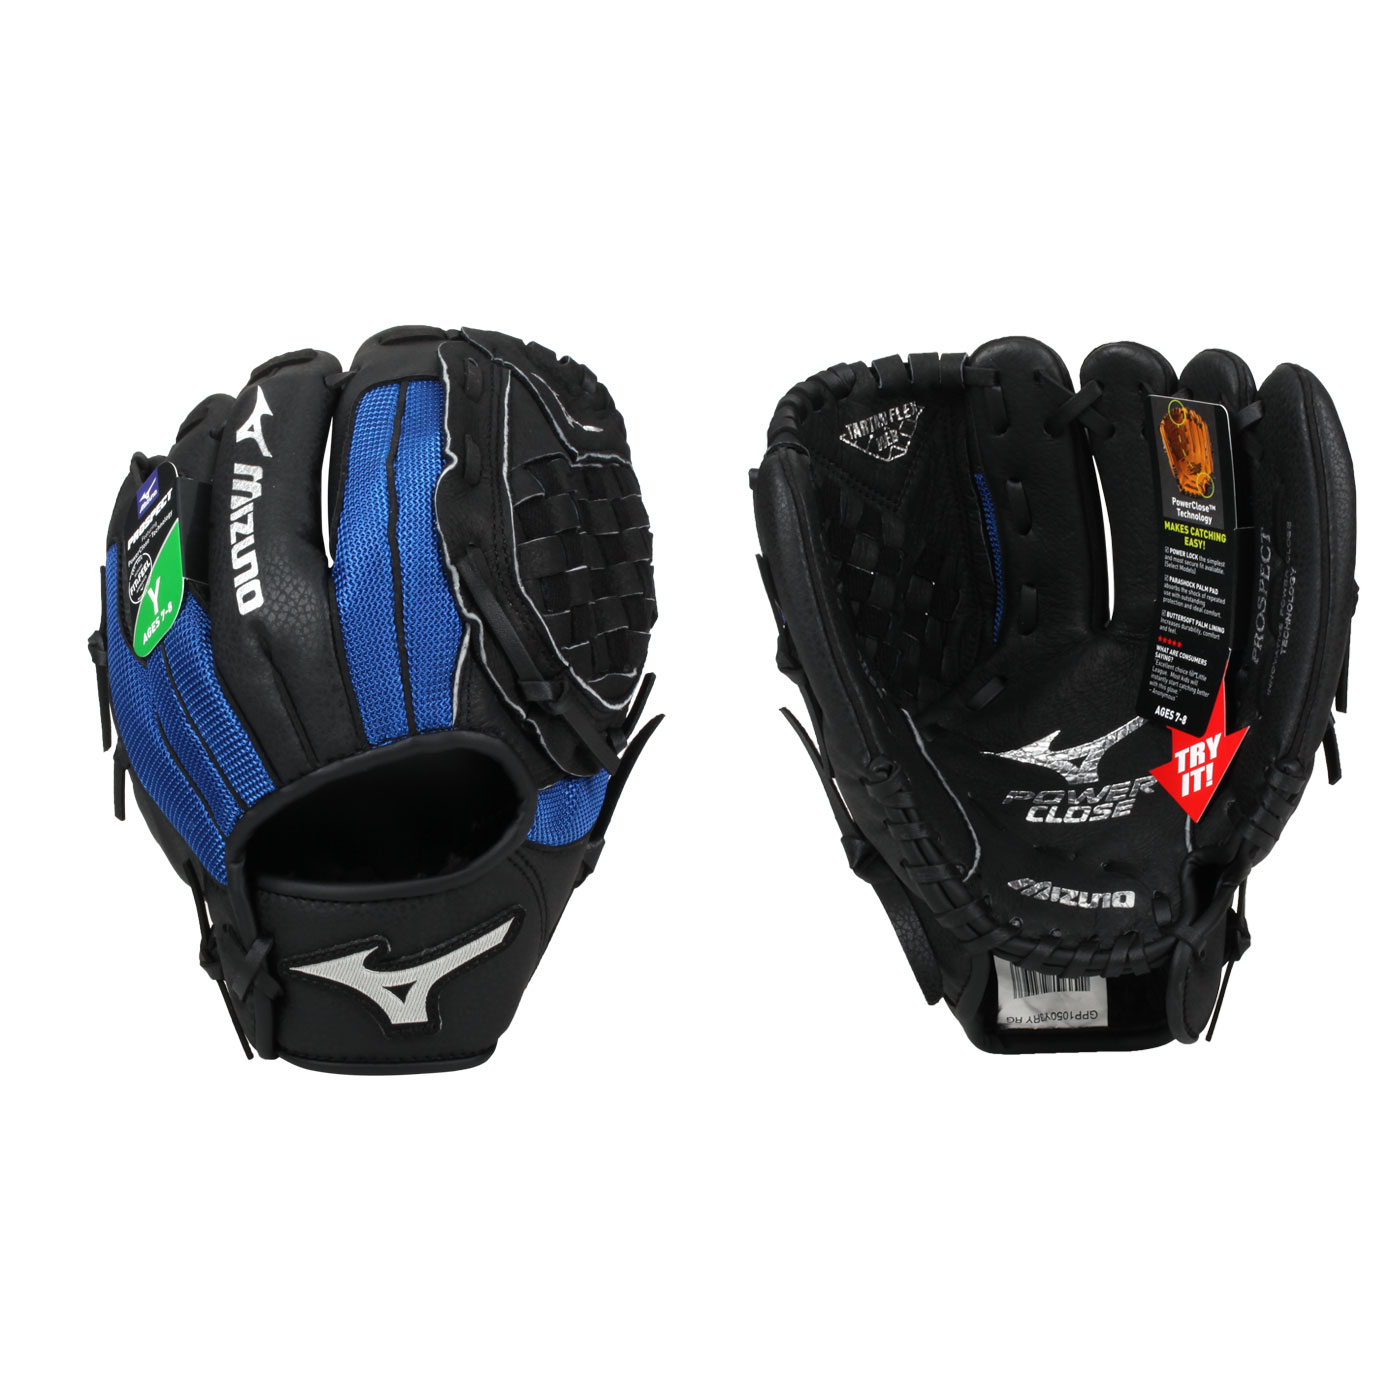 MIZUNO 少年用手套(右投) 312795-R - 黑藍銀